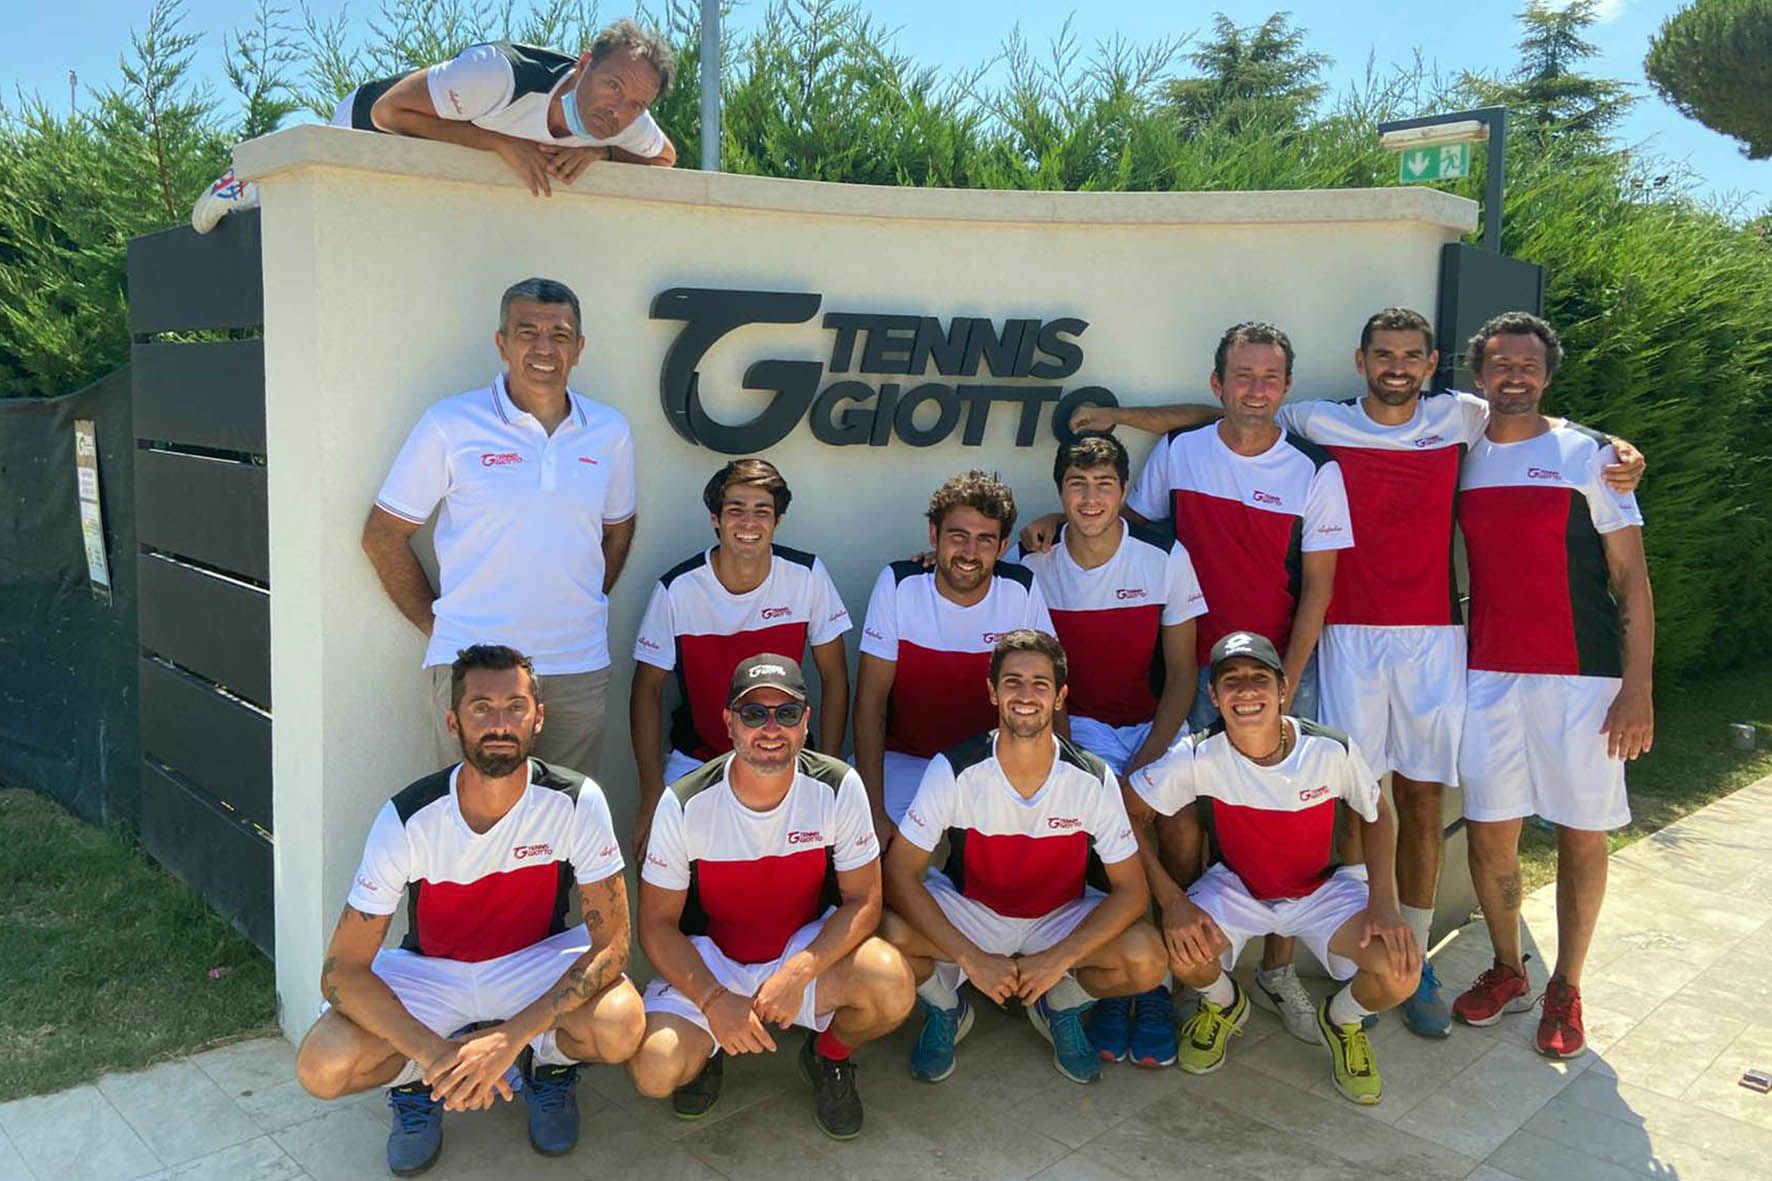 Tennis Giotto - Serie B 2020 (3) (002)